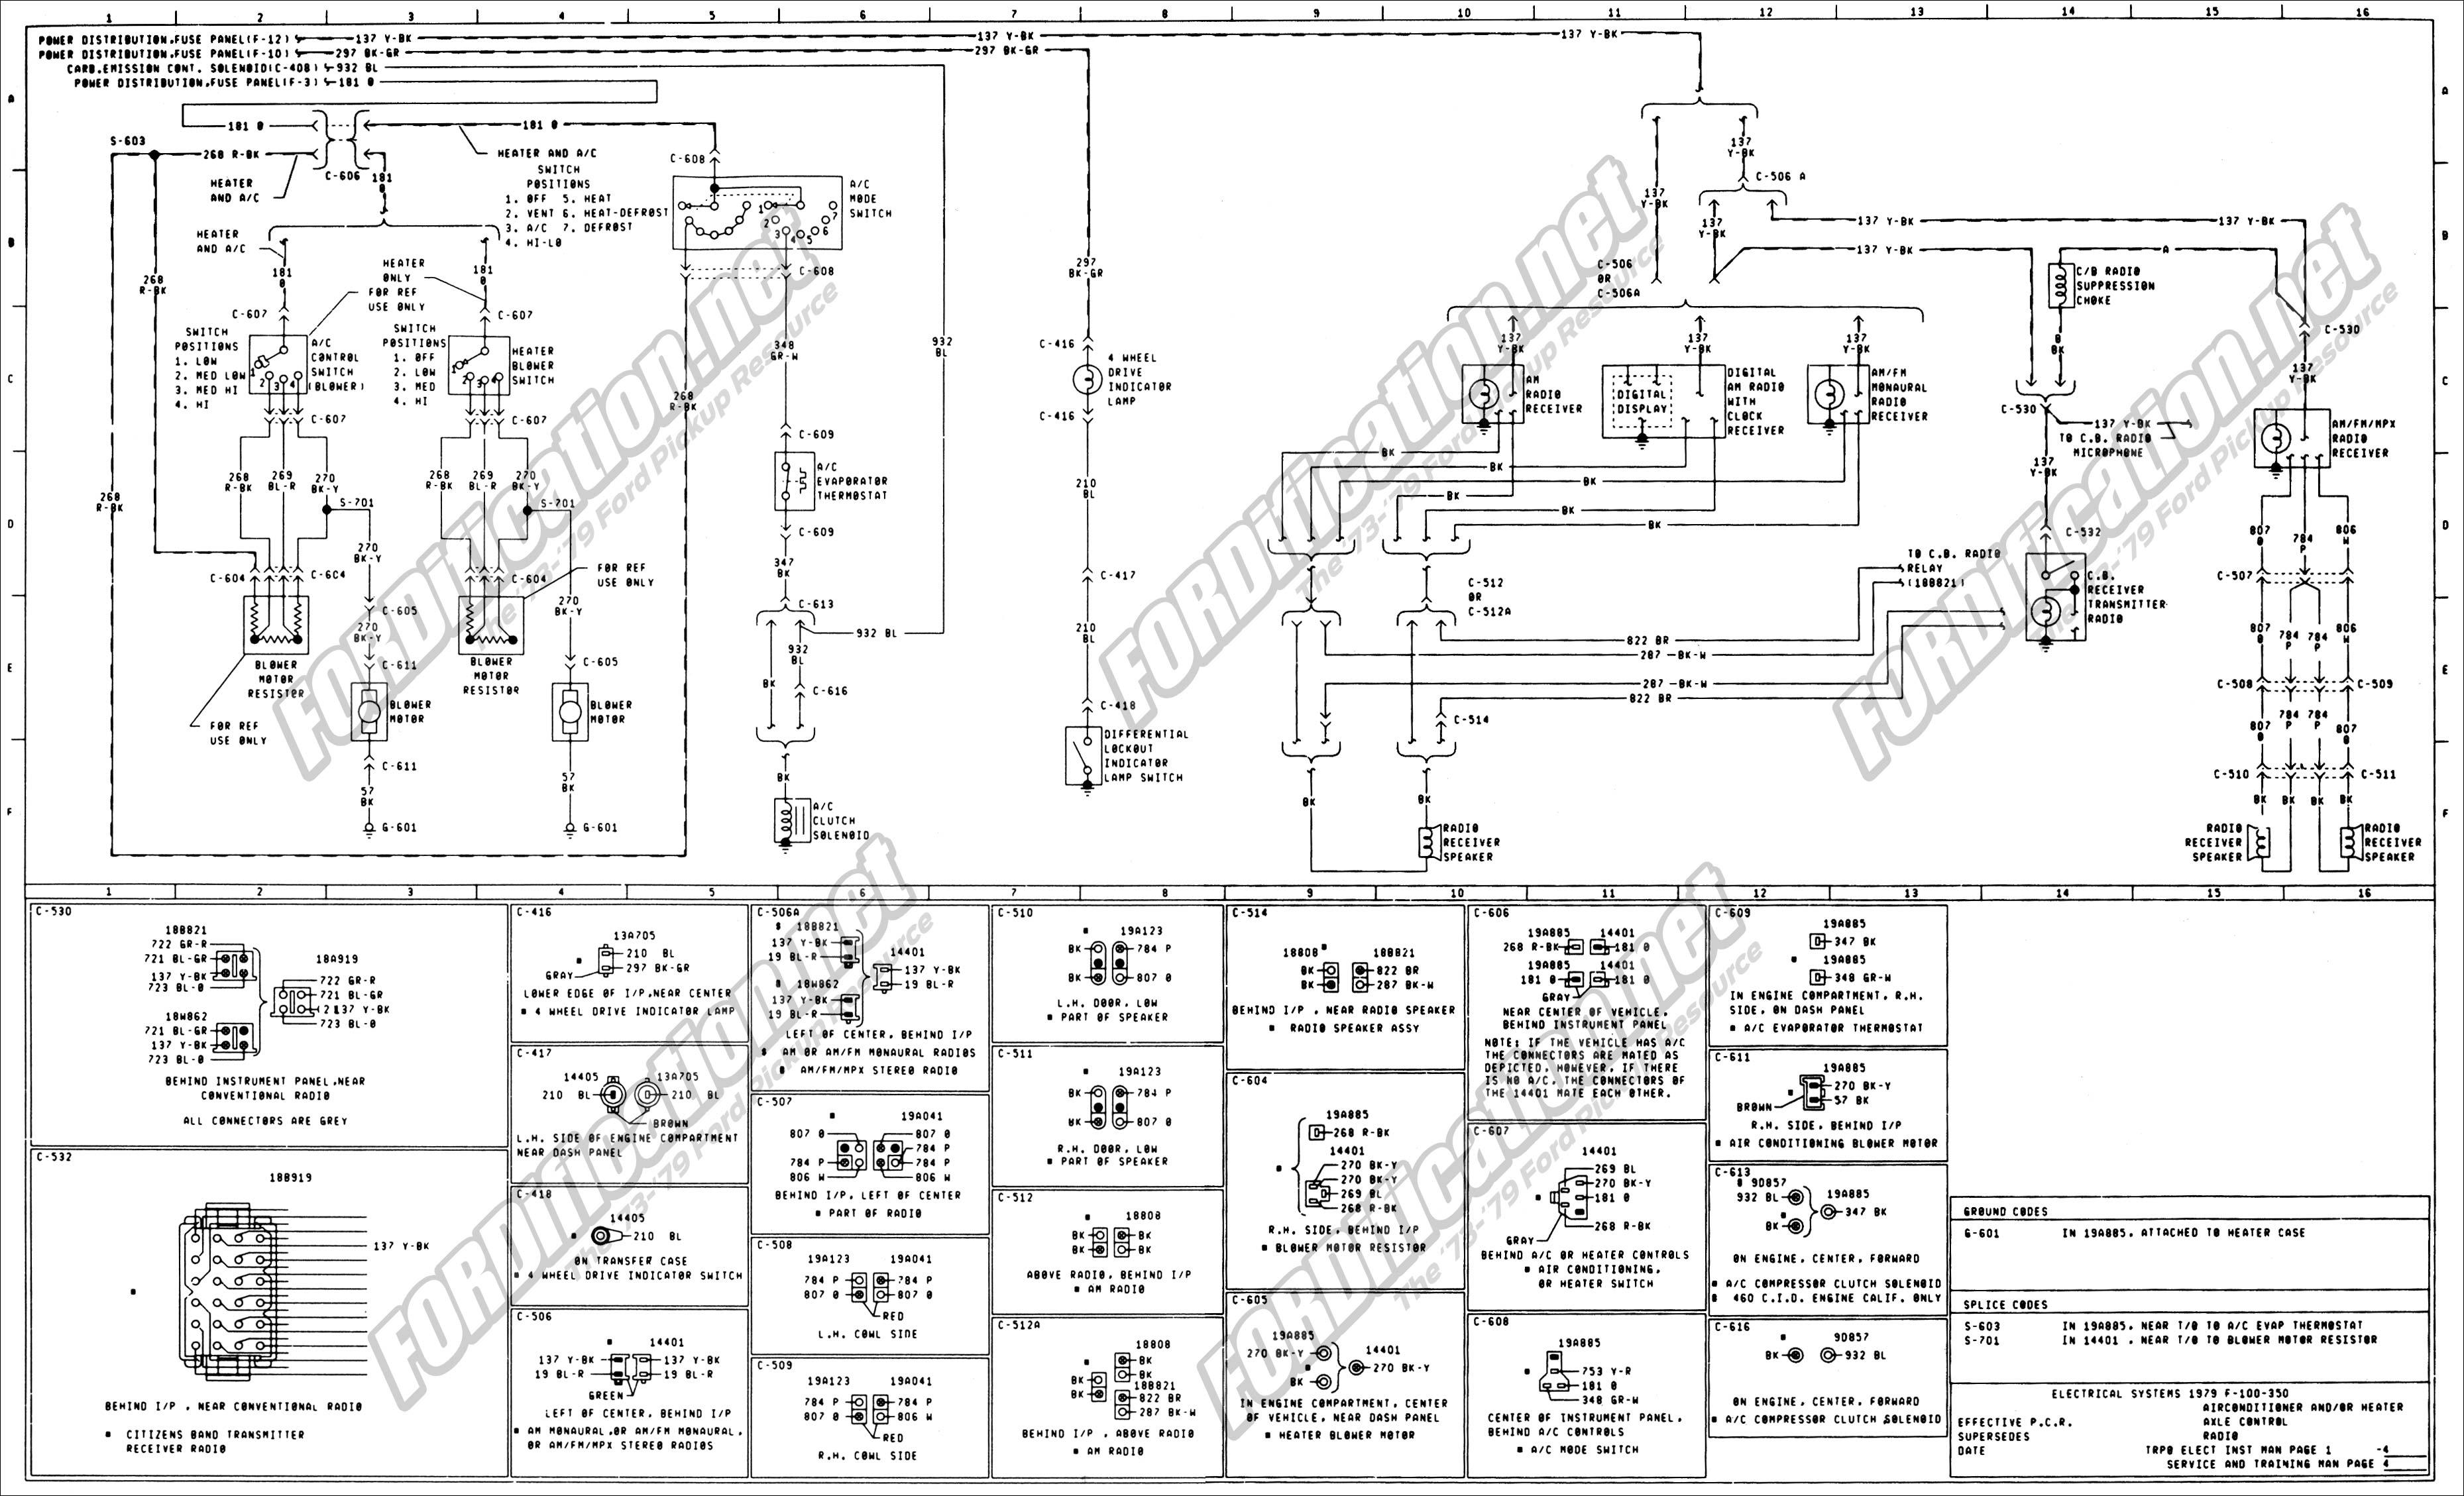 2011 ford f 250 fuse diagram fc 1903  ford f 250 fuse diagram further 2005 ford f 150 wiring  fuse diagram further 2005 ford f 150